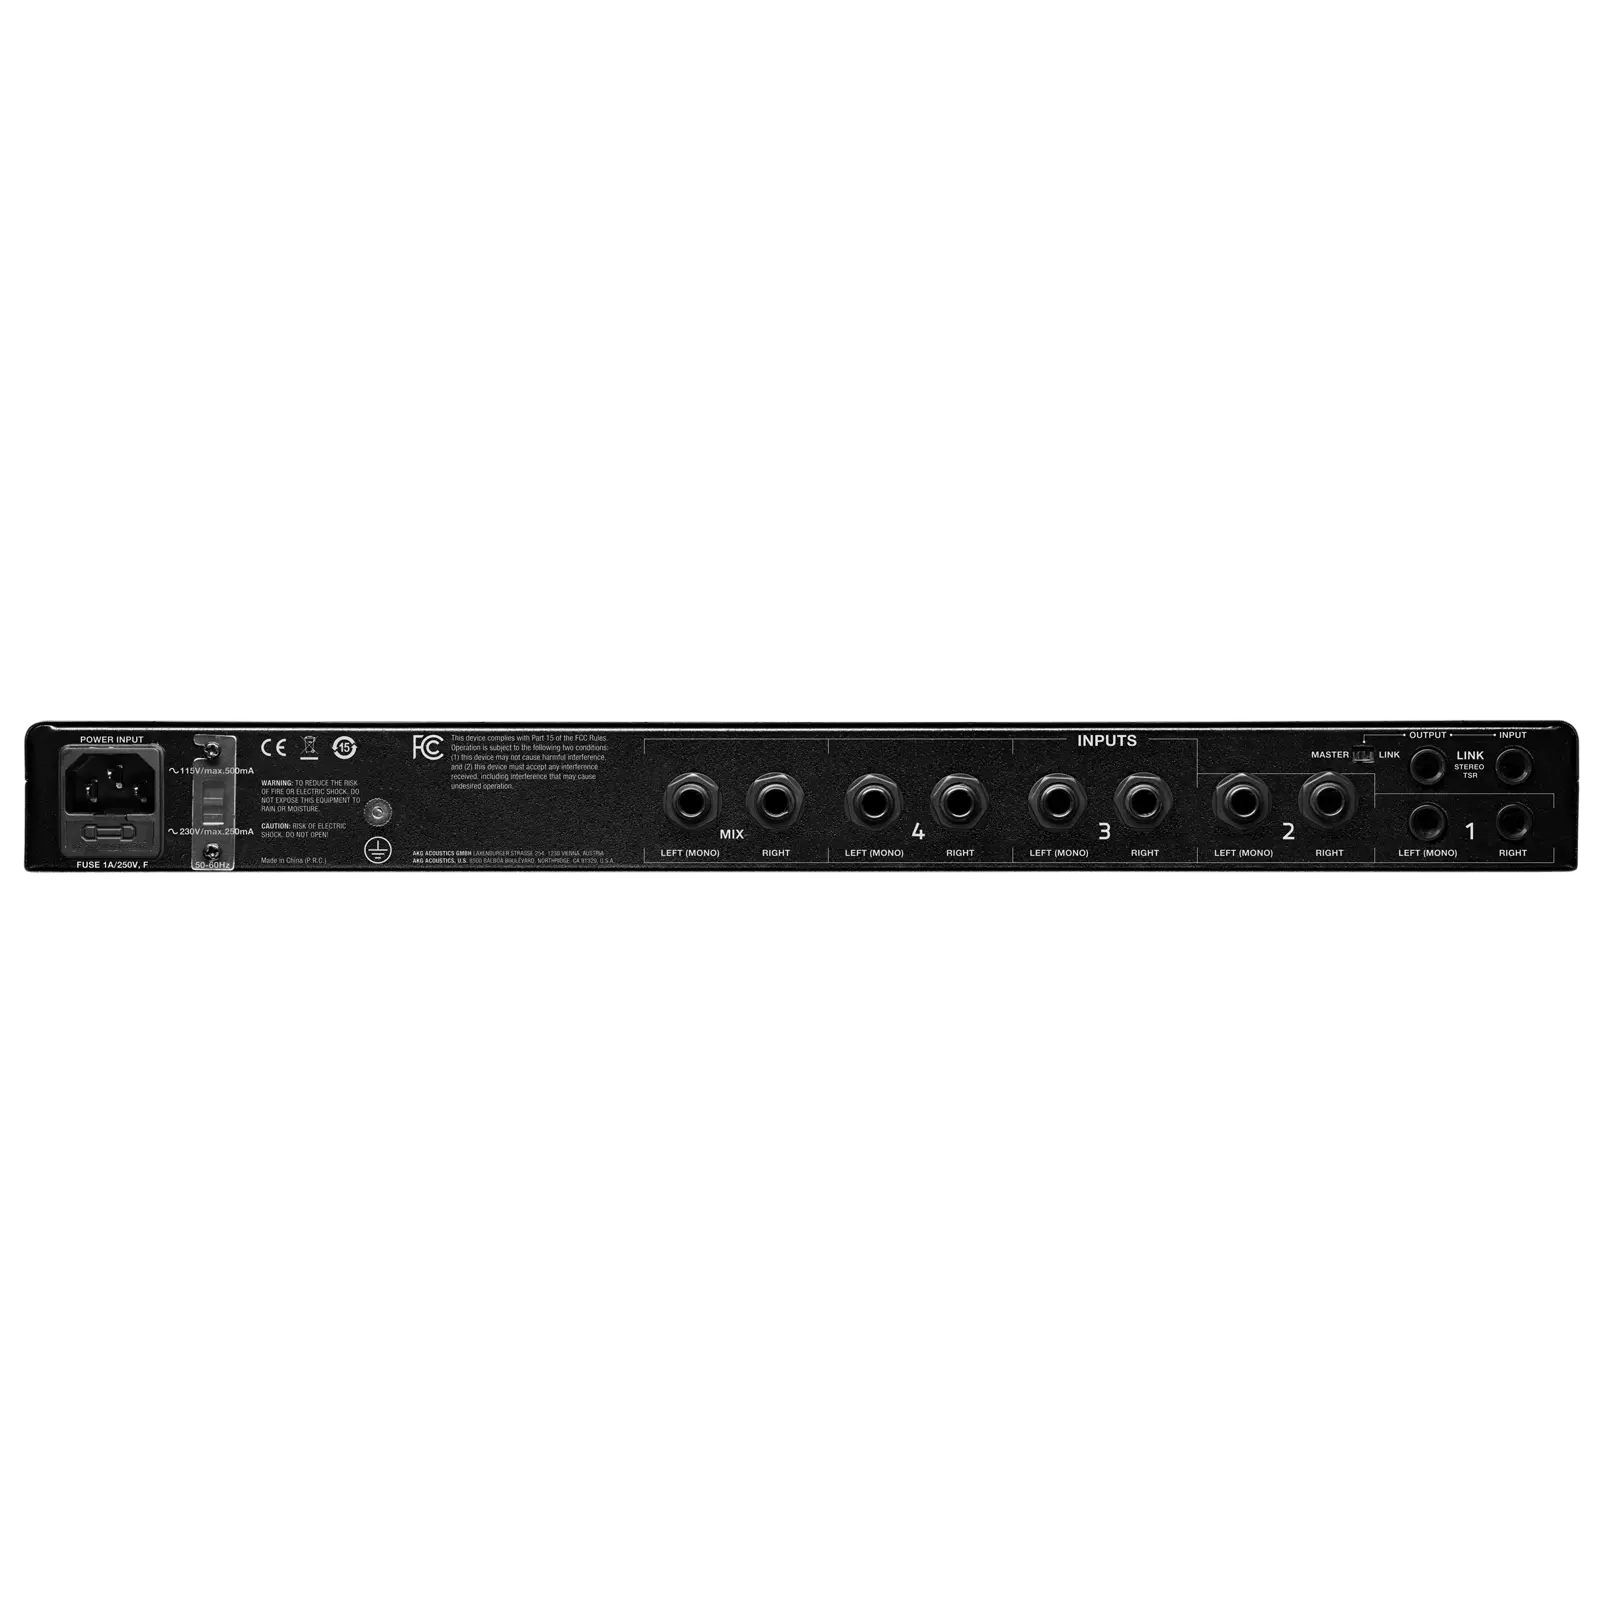 hight resolution of hp6e 6 channel matrix headphone amplifier headphone amp v10 schematic